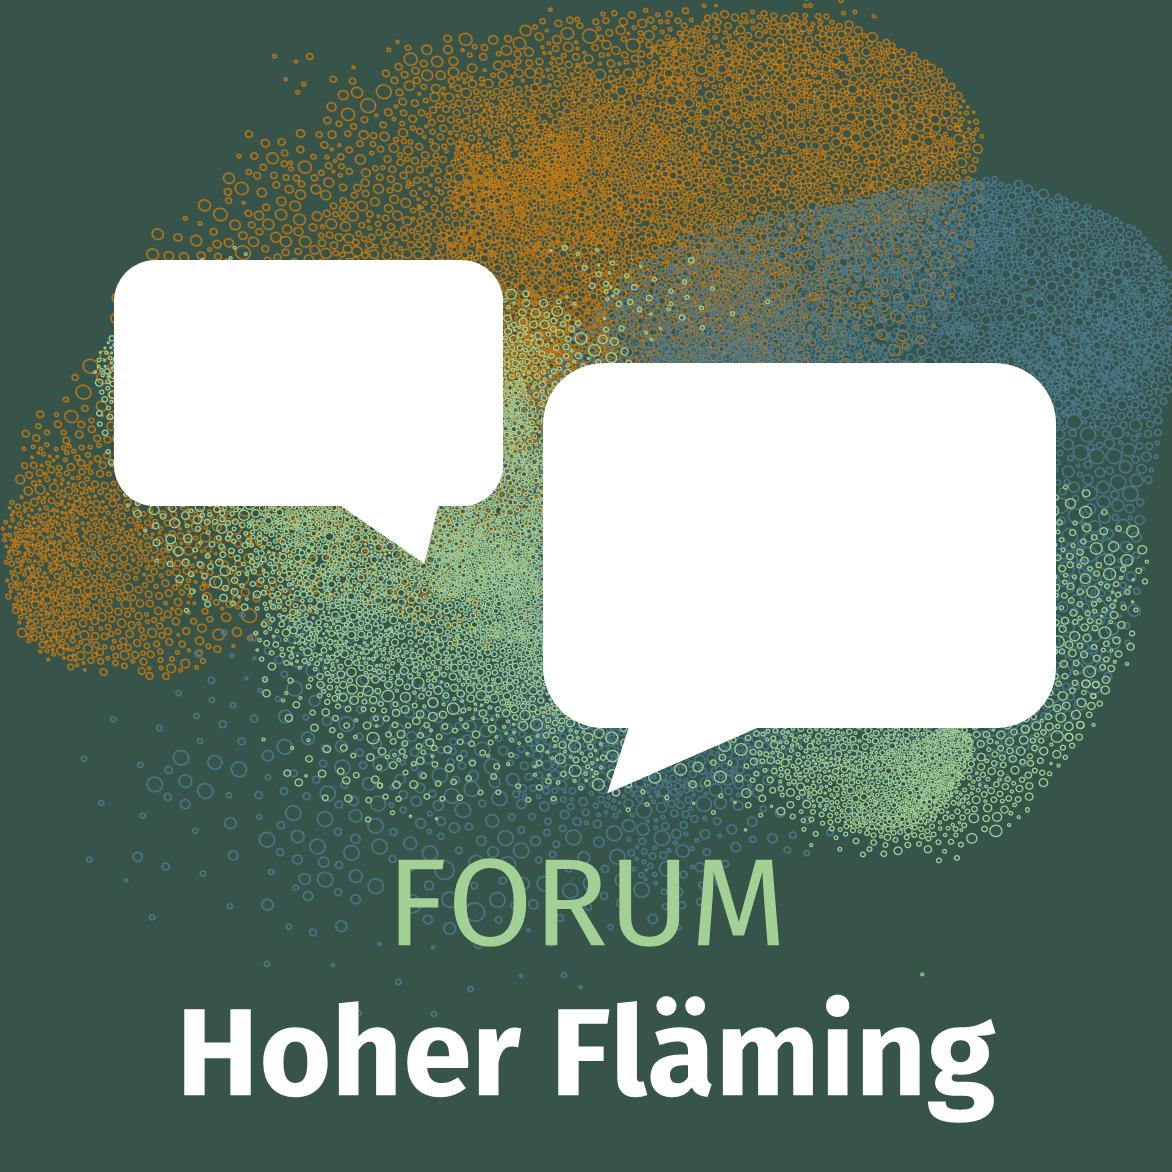 Forum Hoher Fläming